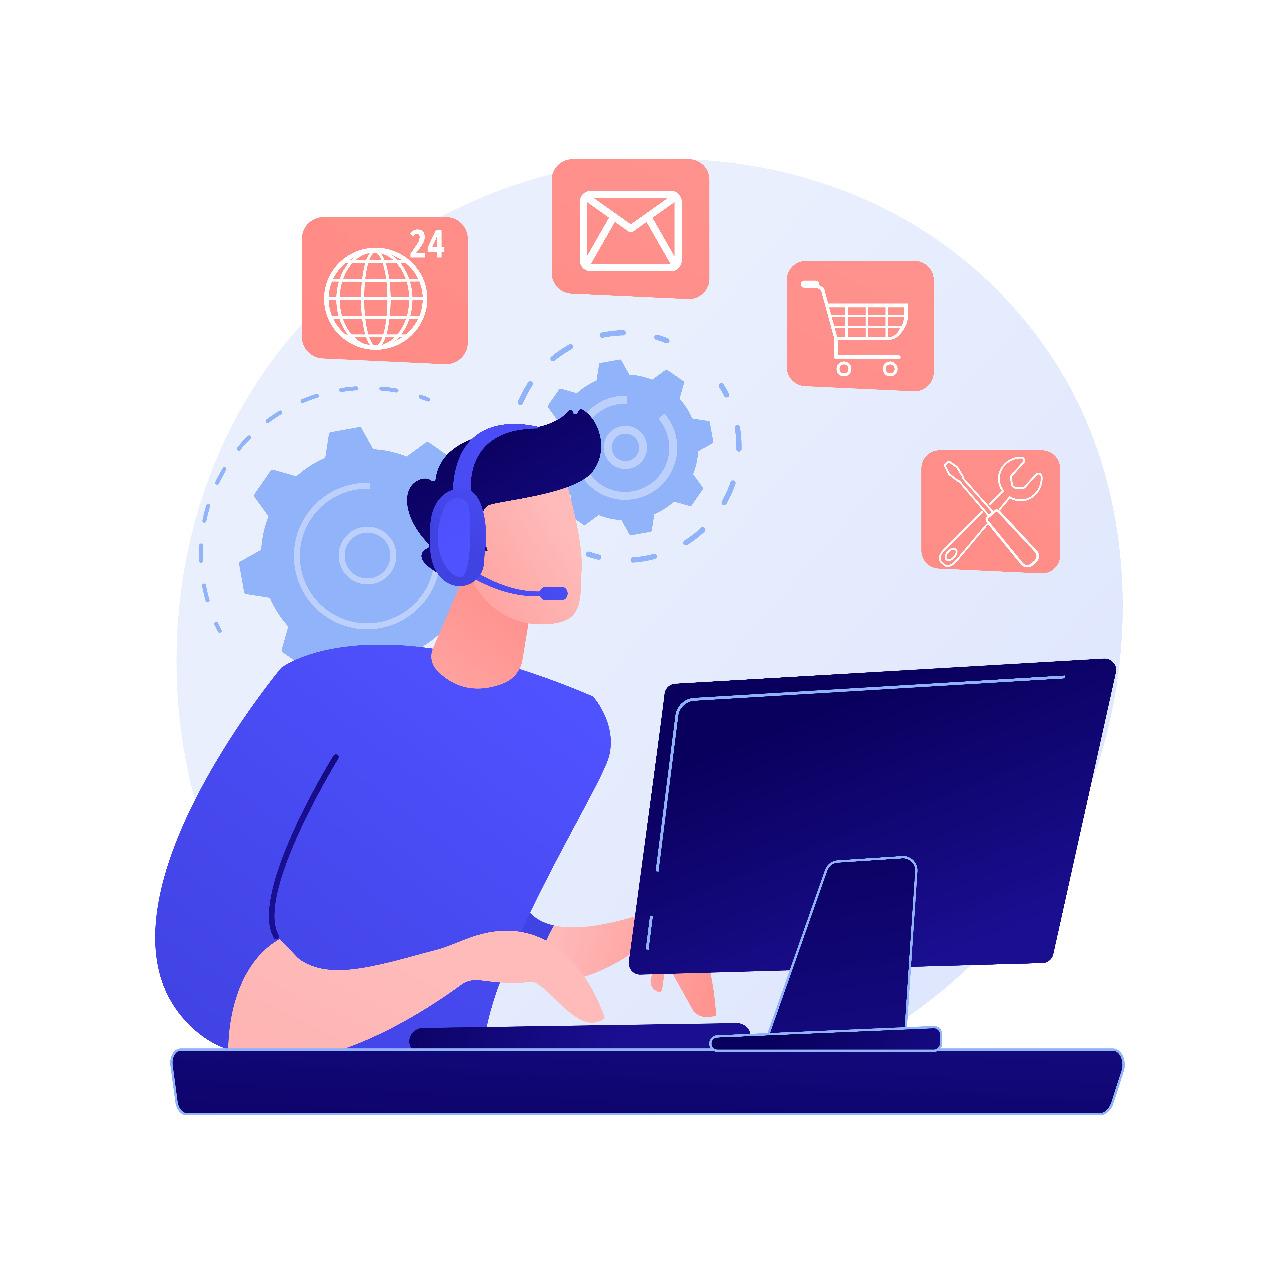 customer-care-executive-vector-illustration